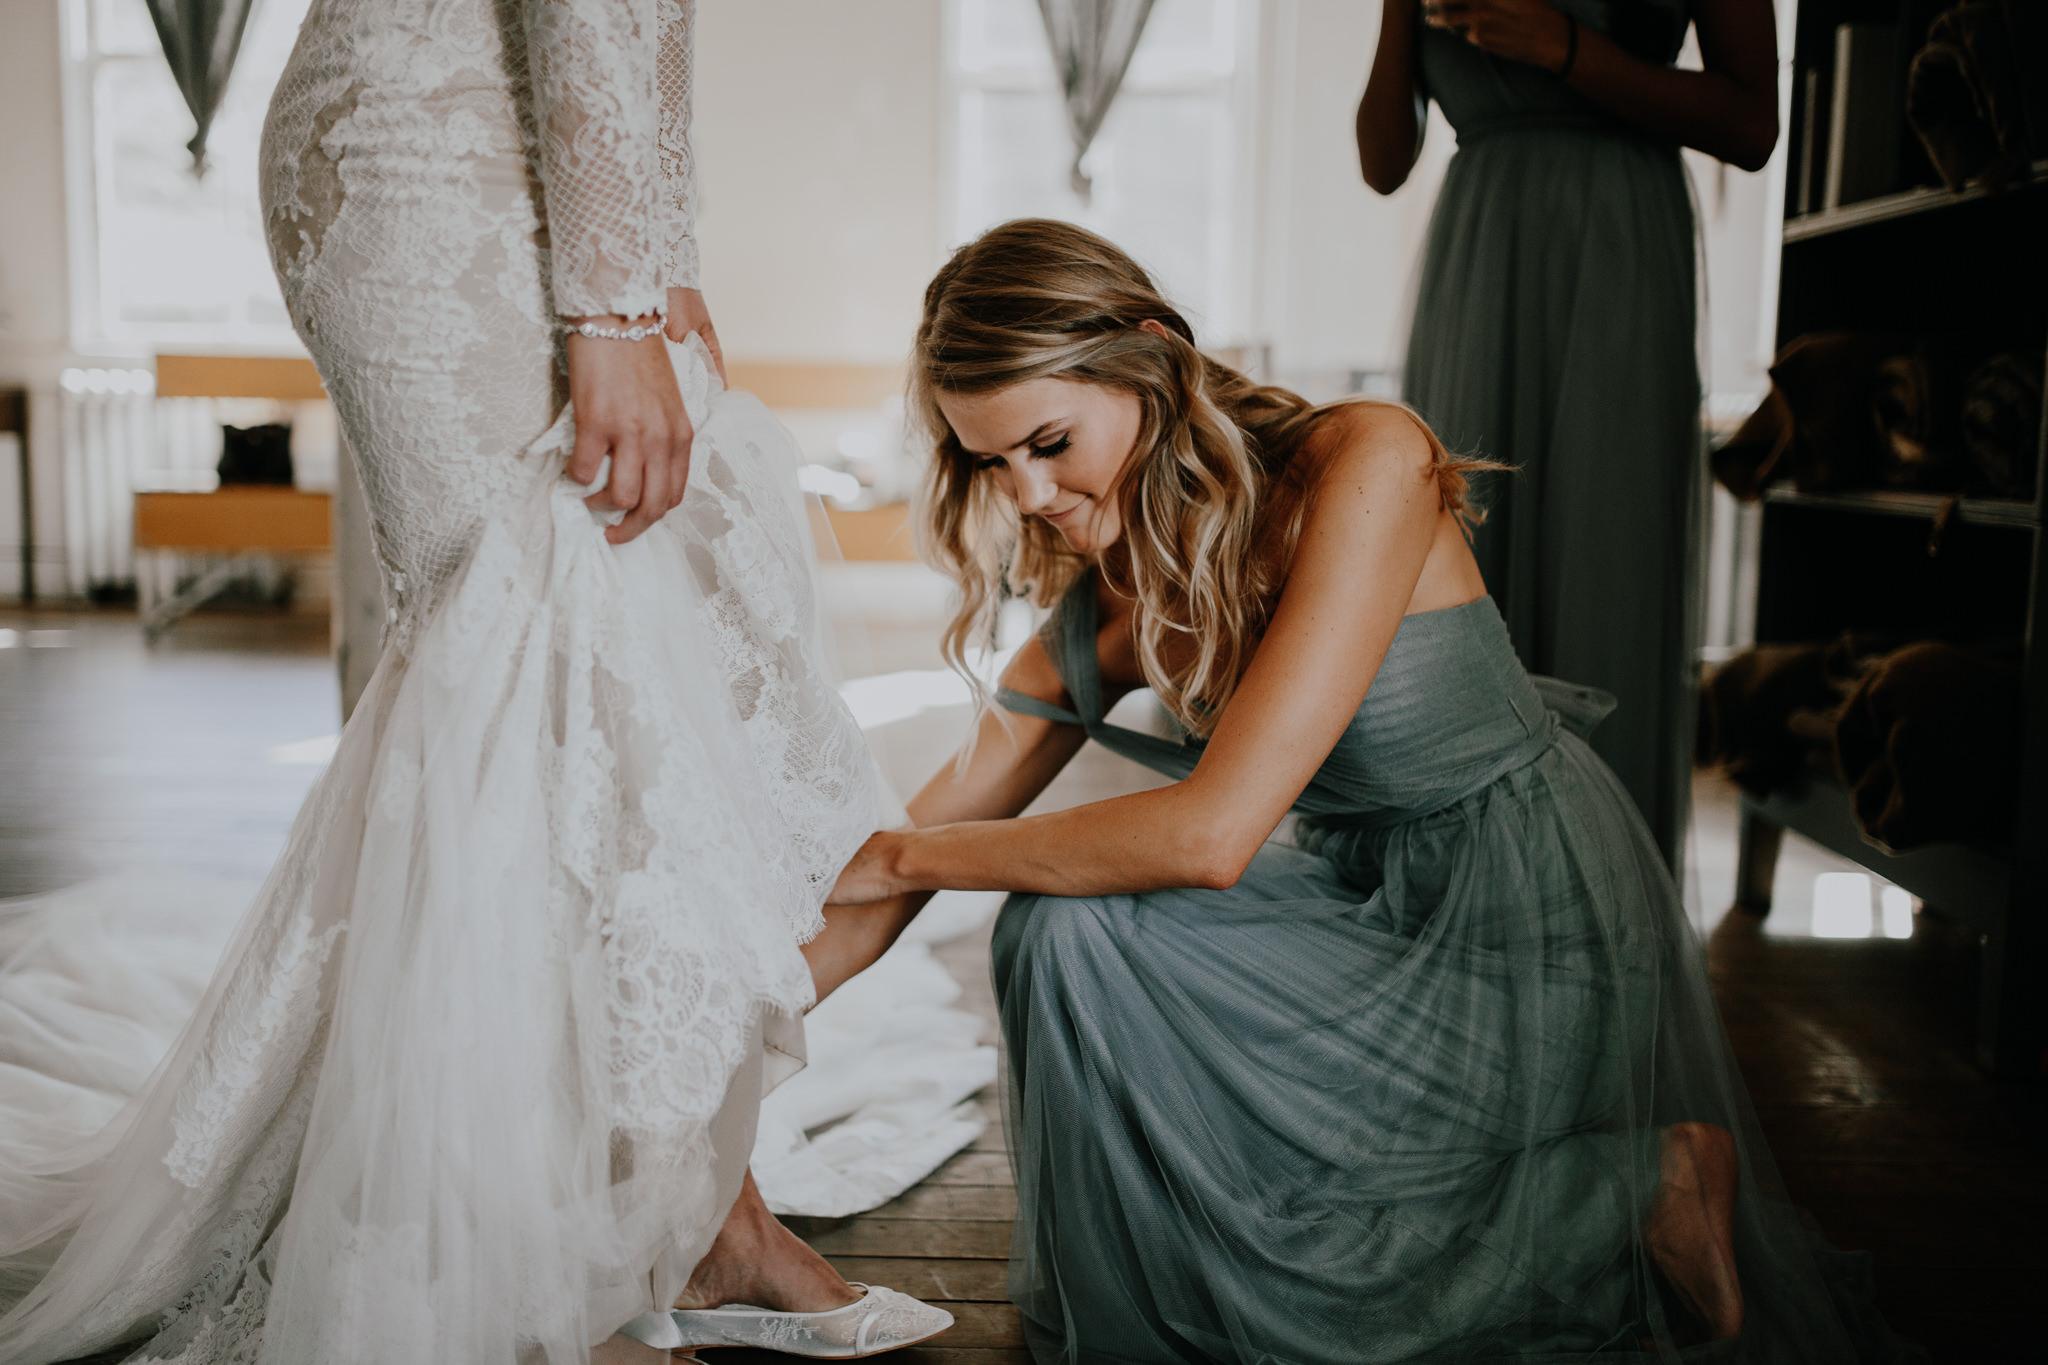 wedding-headlands-center-for-the-arts-sausalito-18.jpg